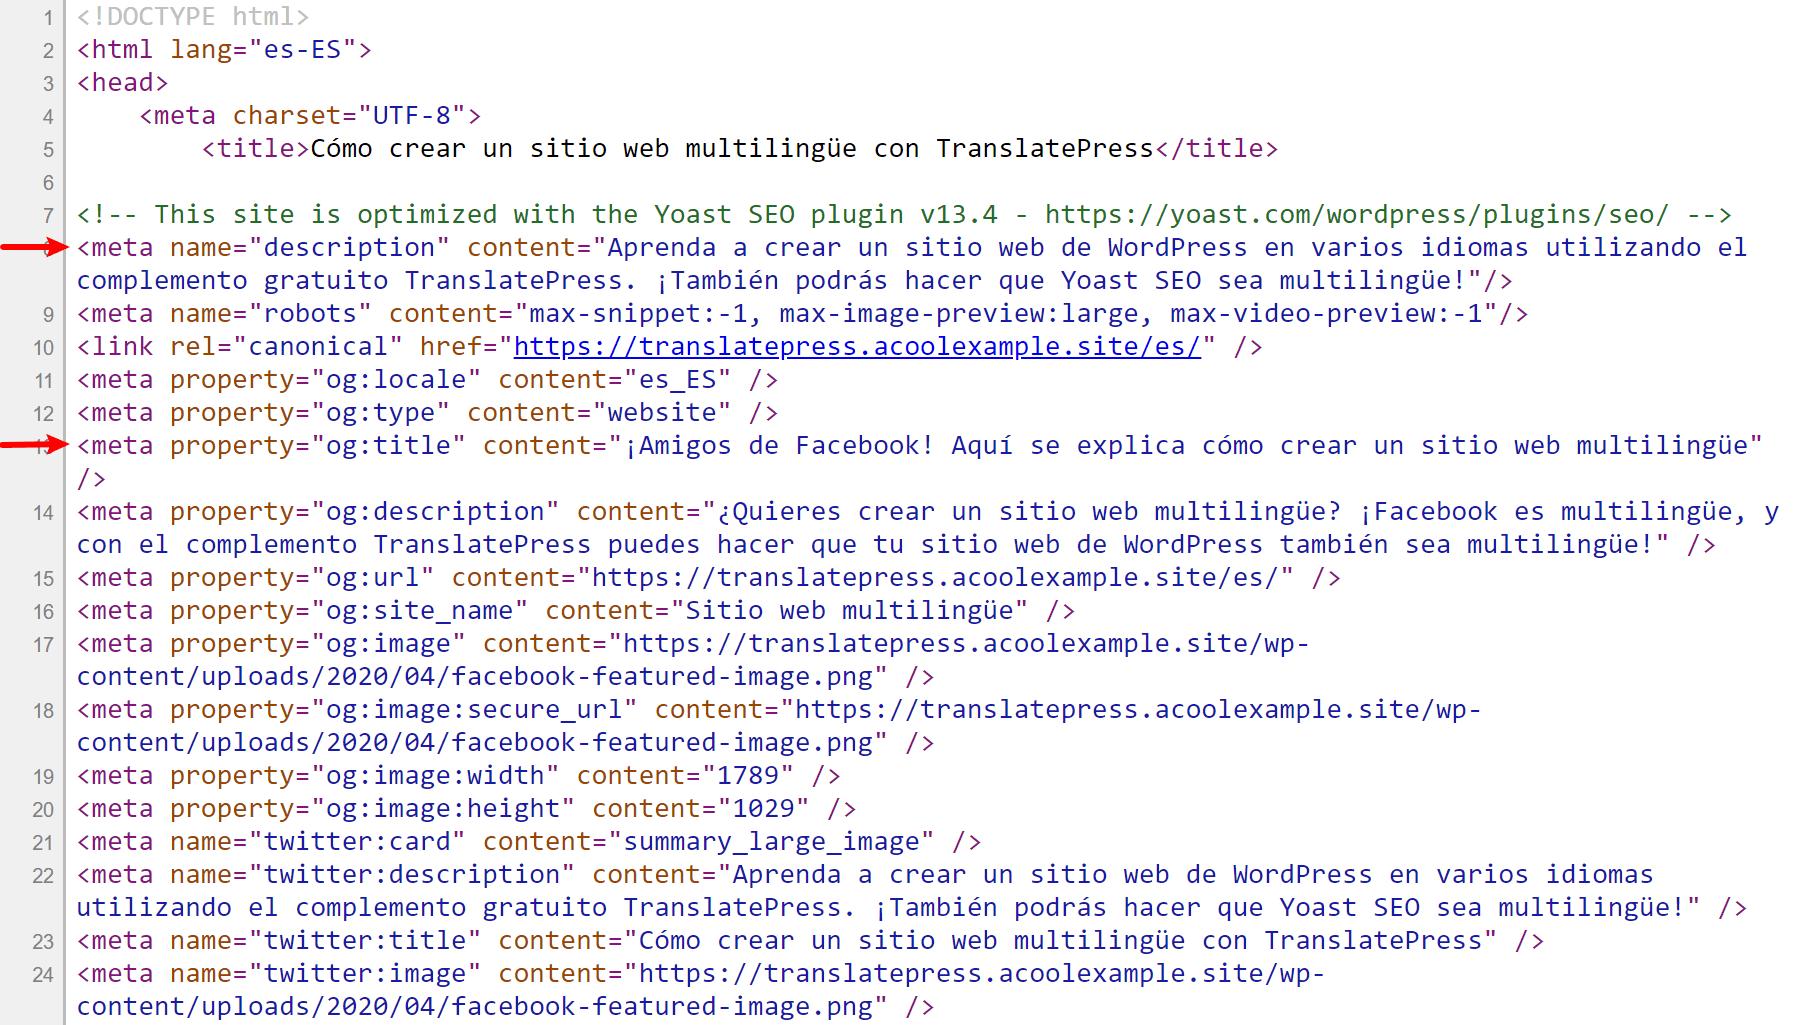 translated yoast seo metadata